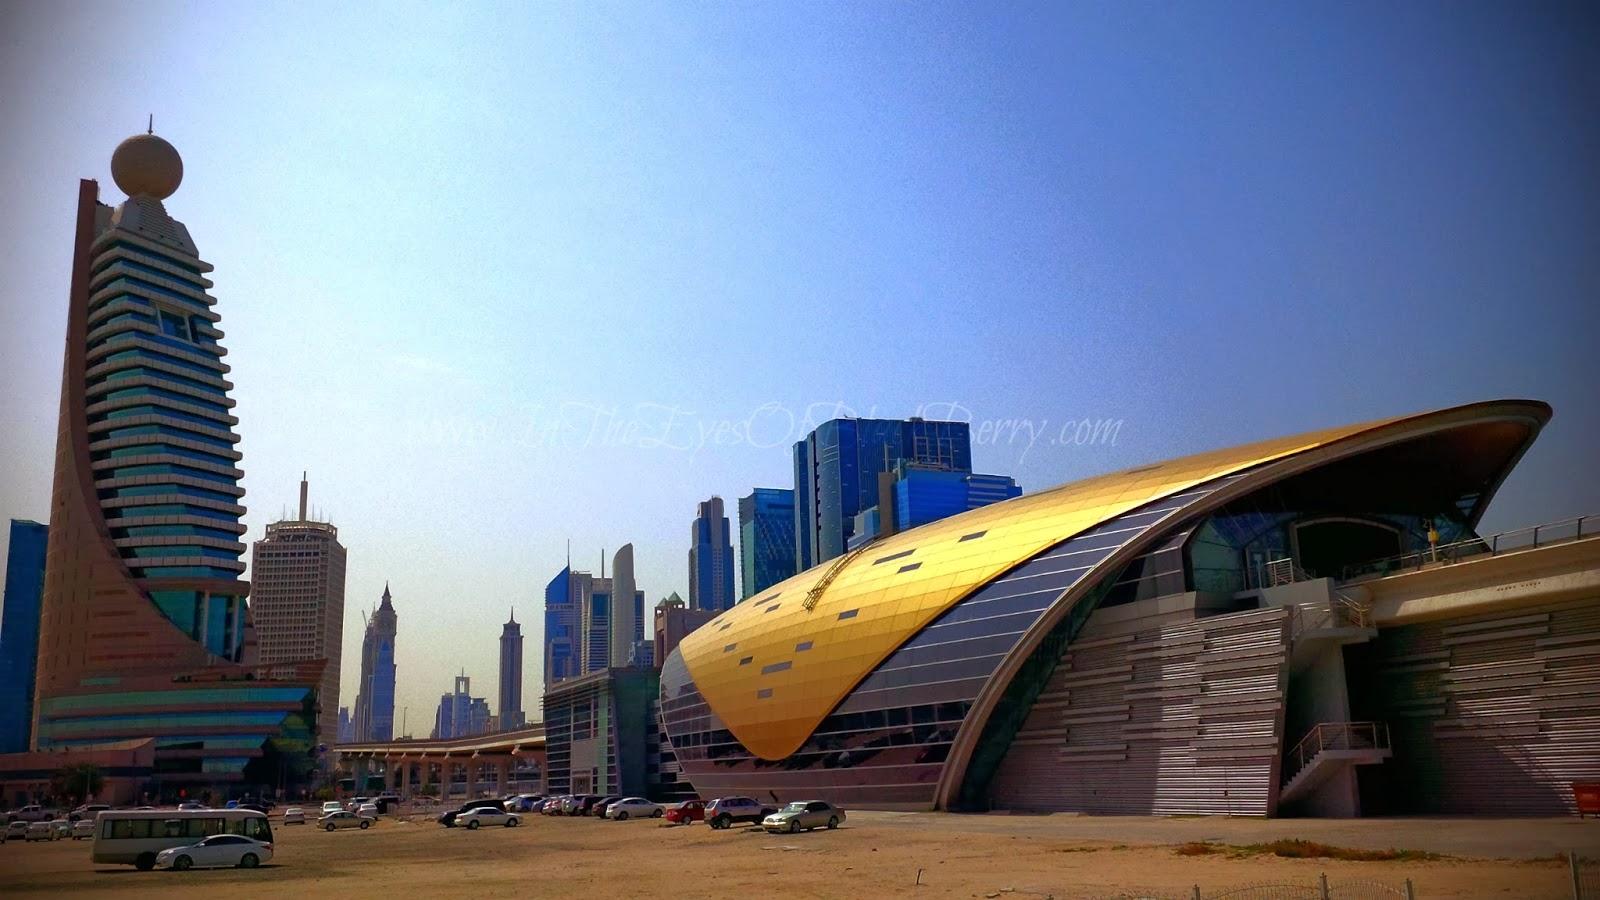 architecture dubai 500 ko browse info on architecture dubai 500 ko